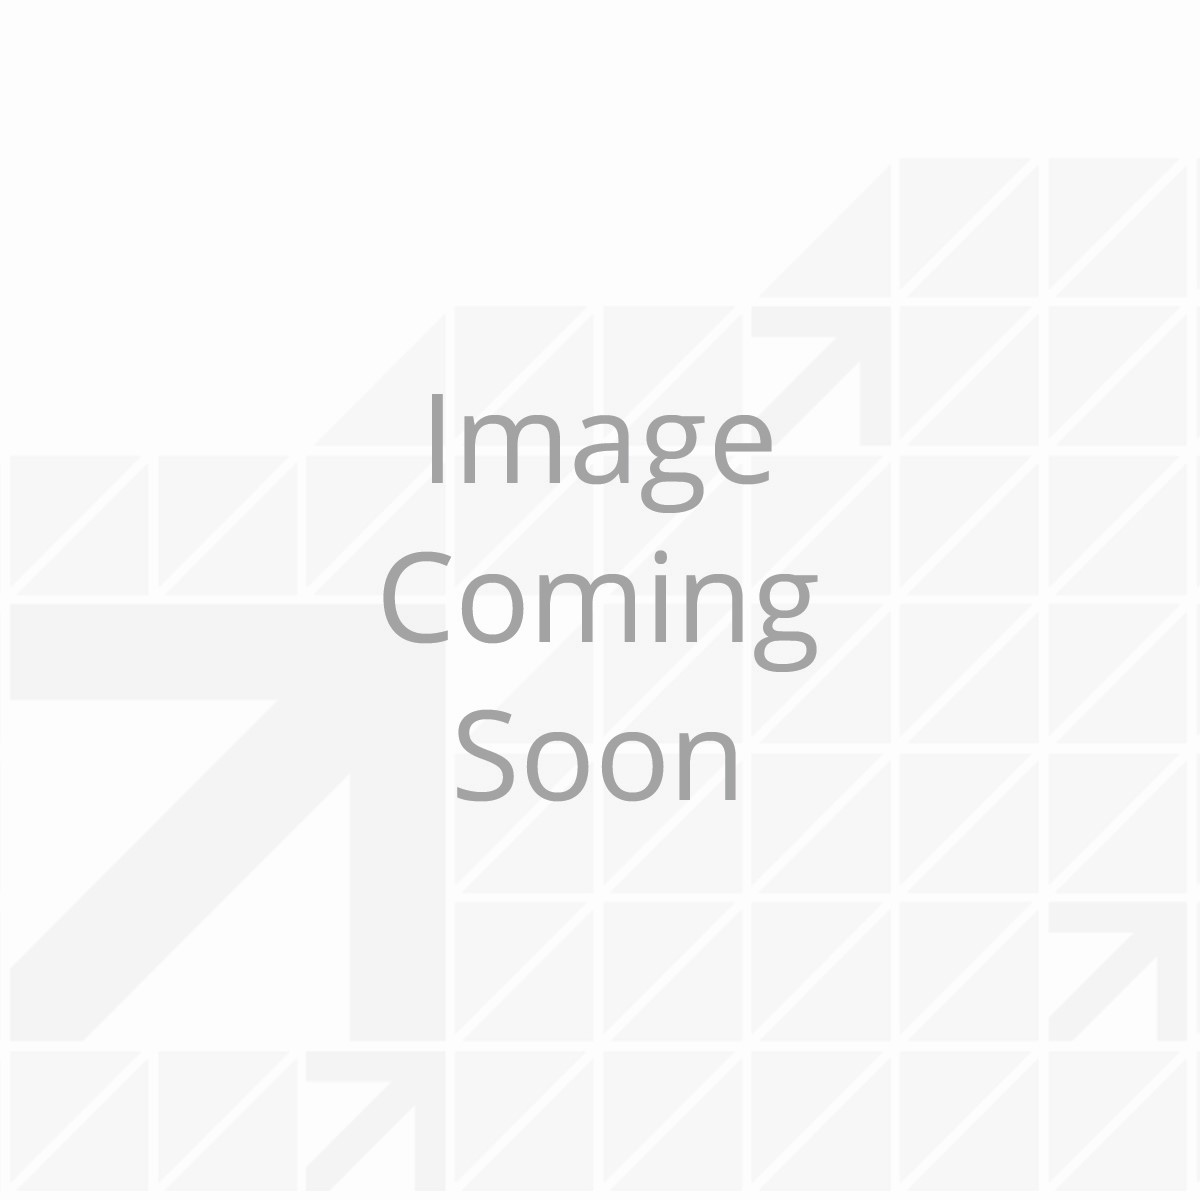 Double Lip Grease Sea v- 2800#-3500# Trailer Axle Hub